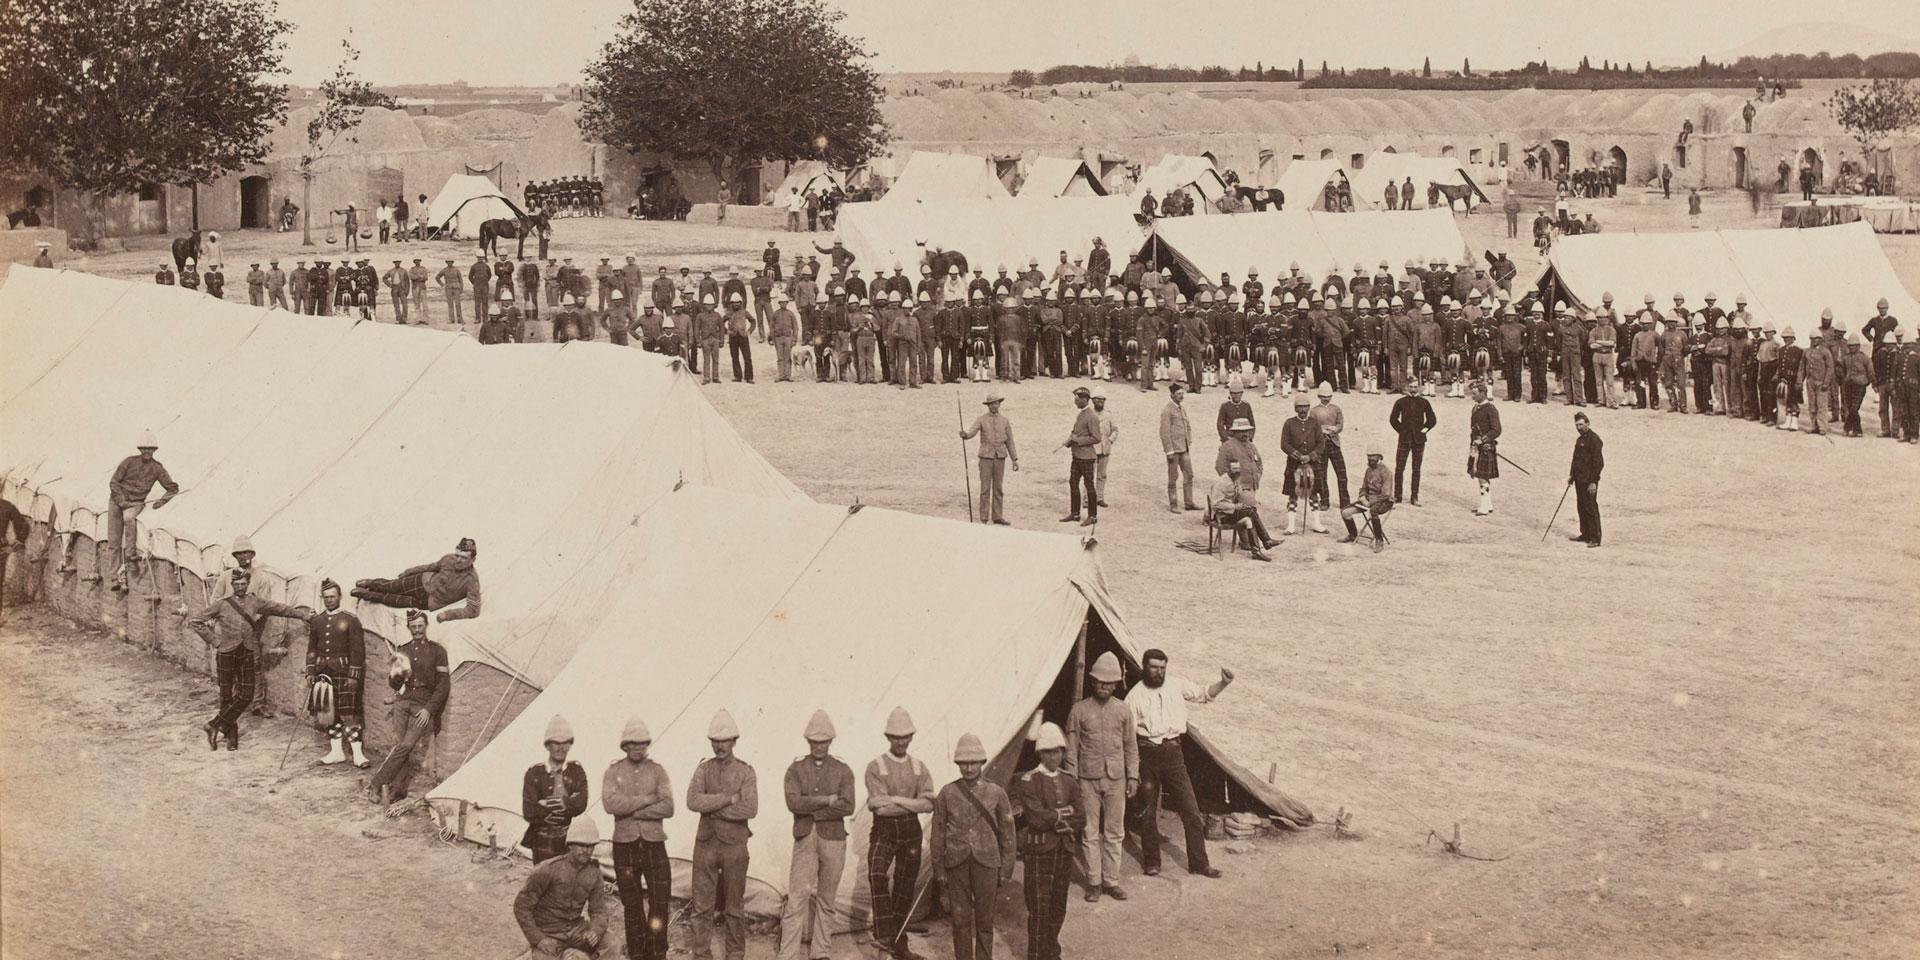 The 78th Highlanders at Barrack Square, Kandahar, c1880